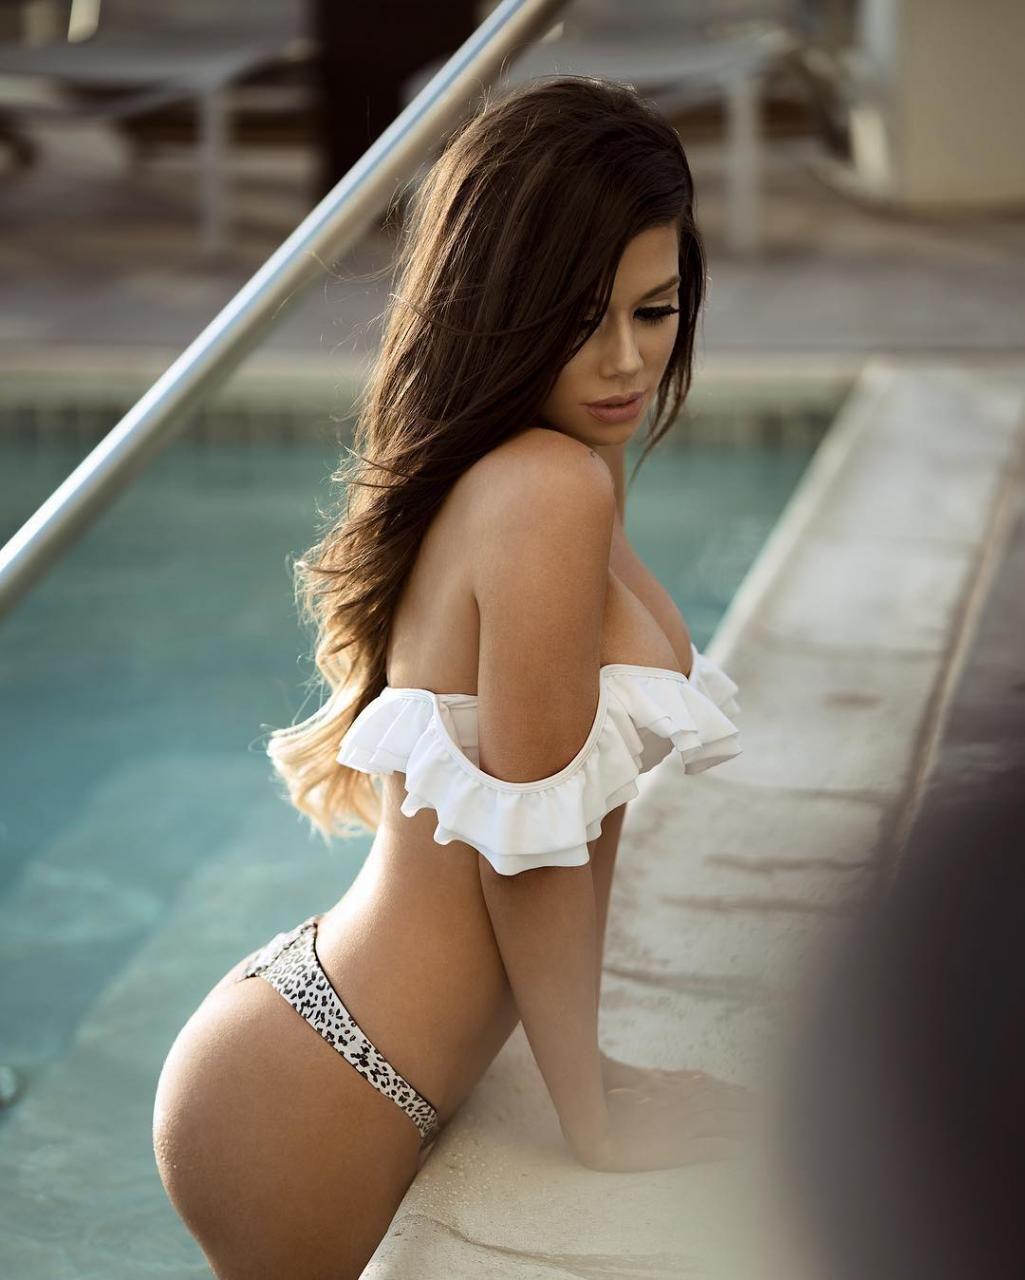 Bikini Crisp White Pinterest Stay Classy Classy And